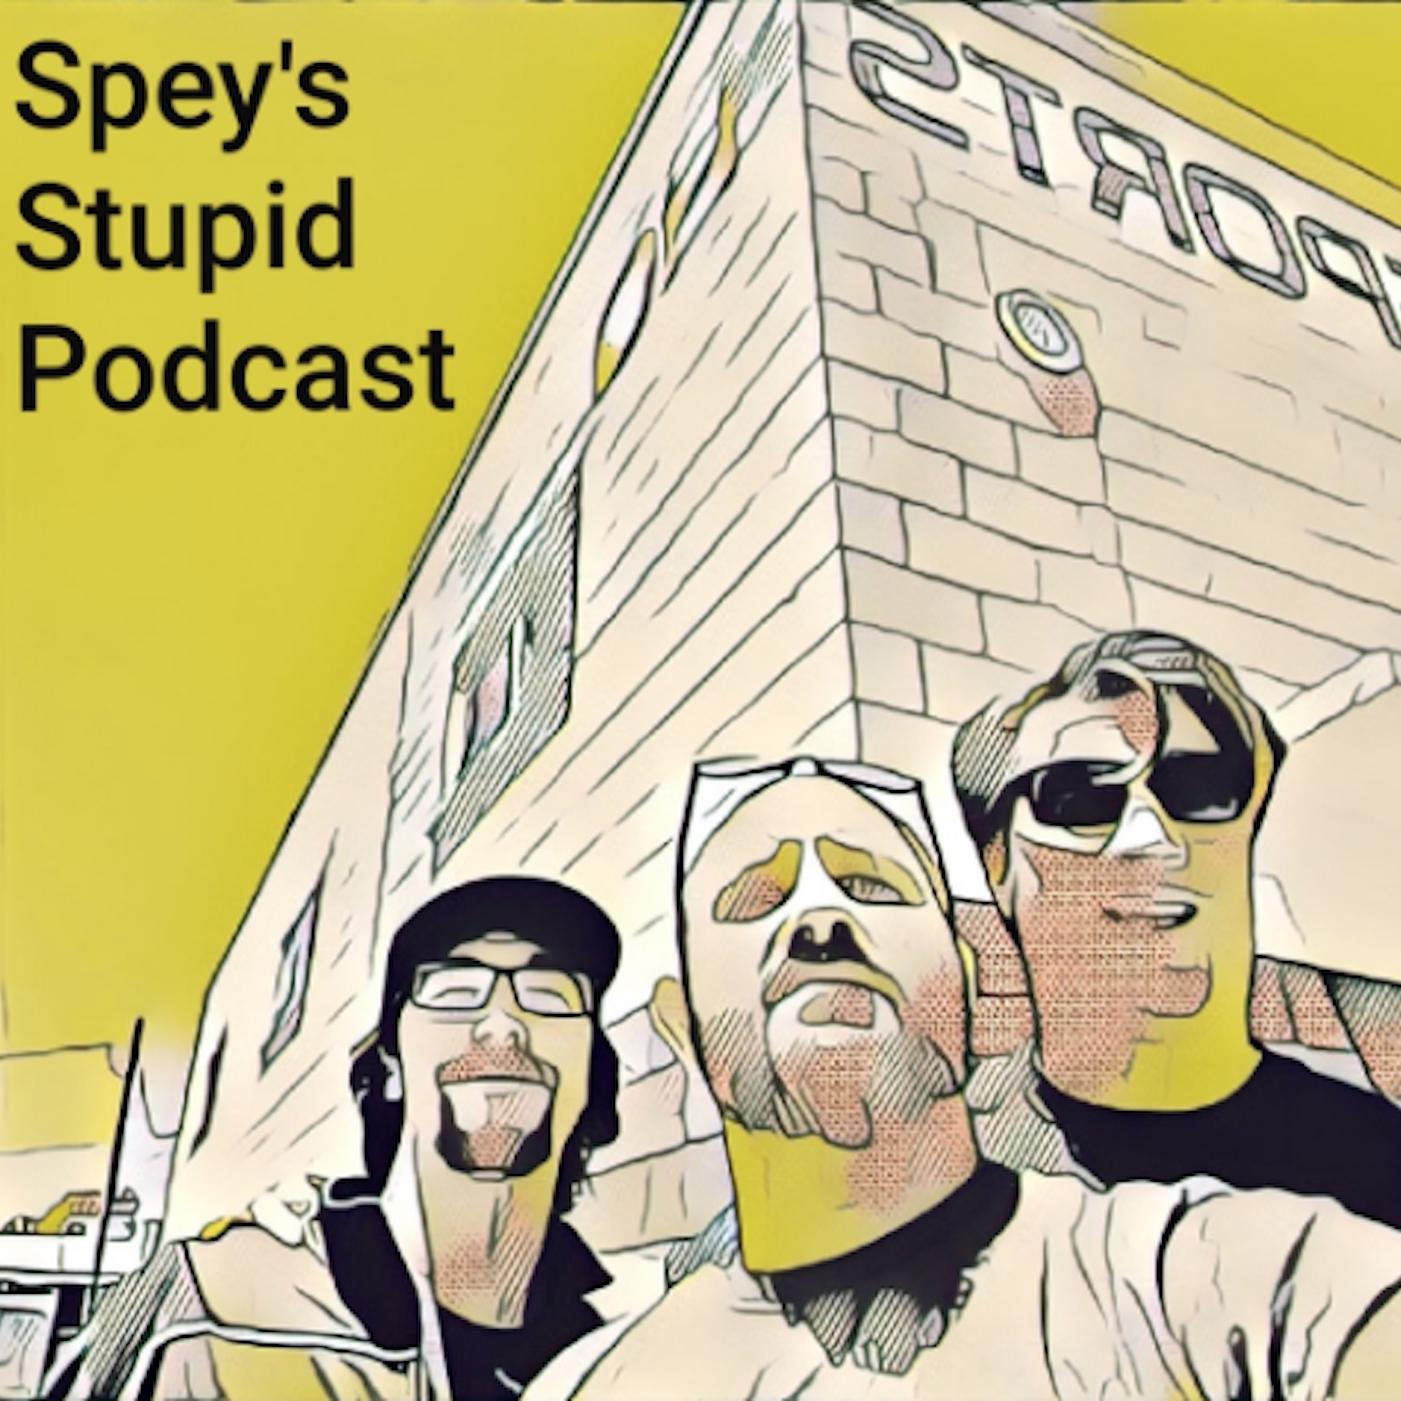 Spey's Stupid Podcast show art